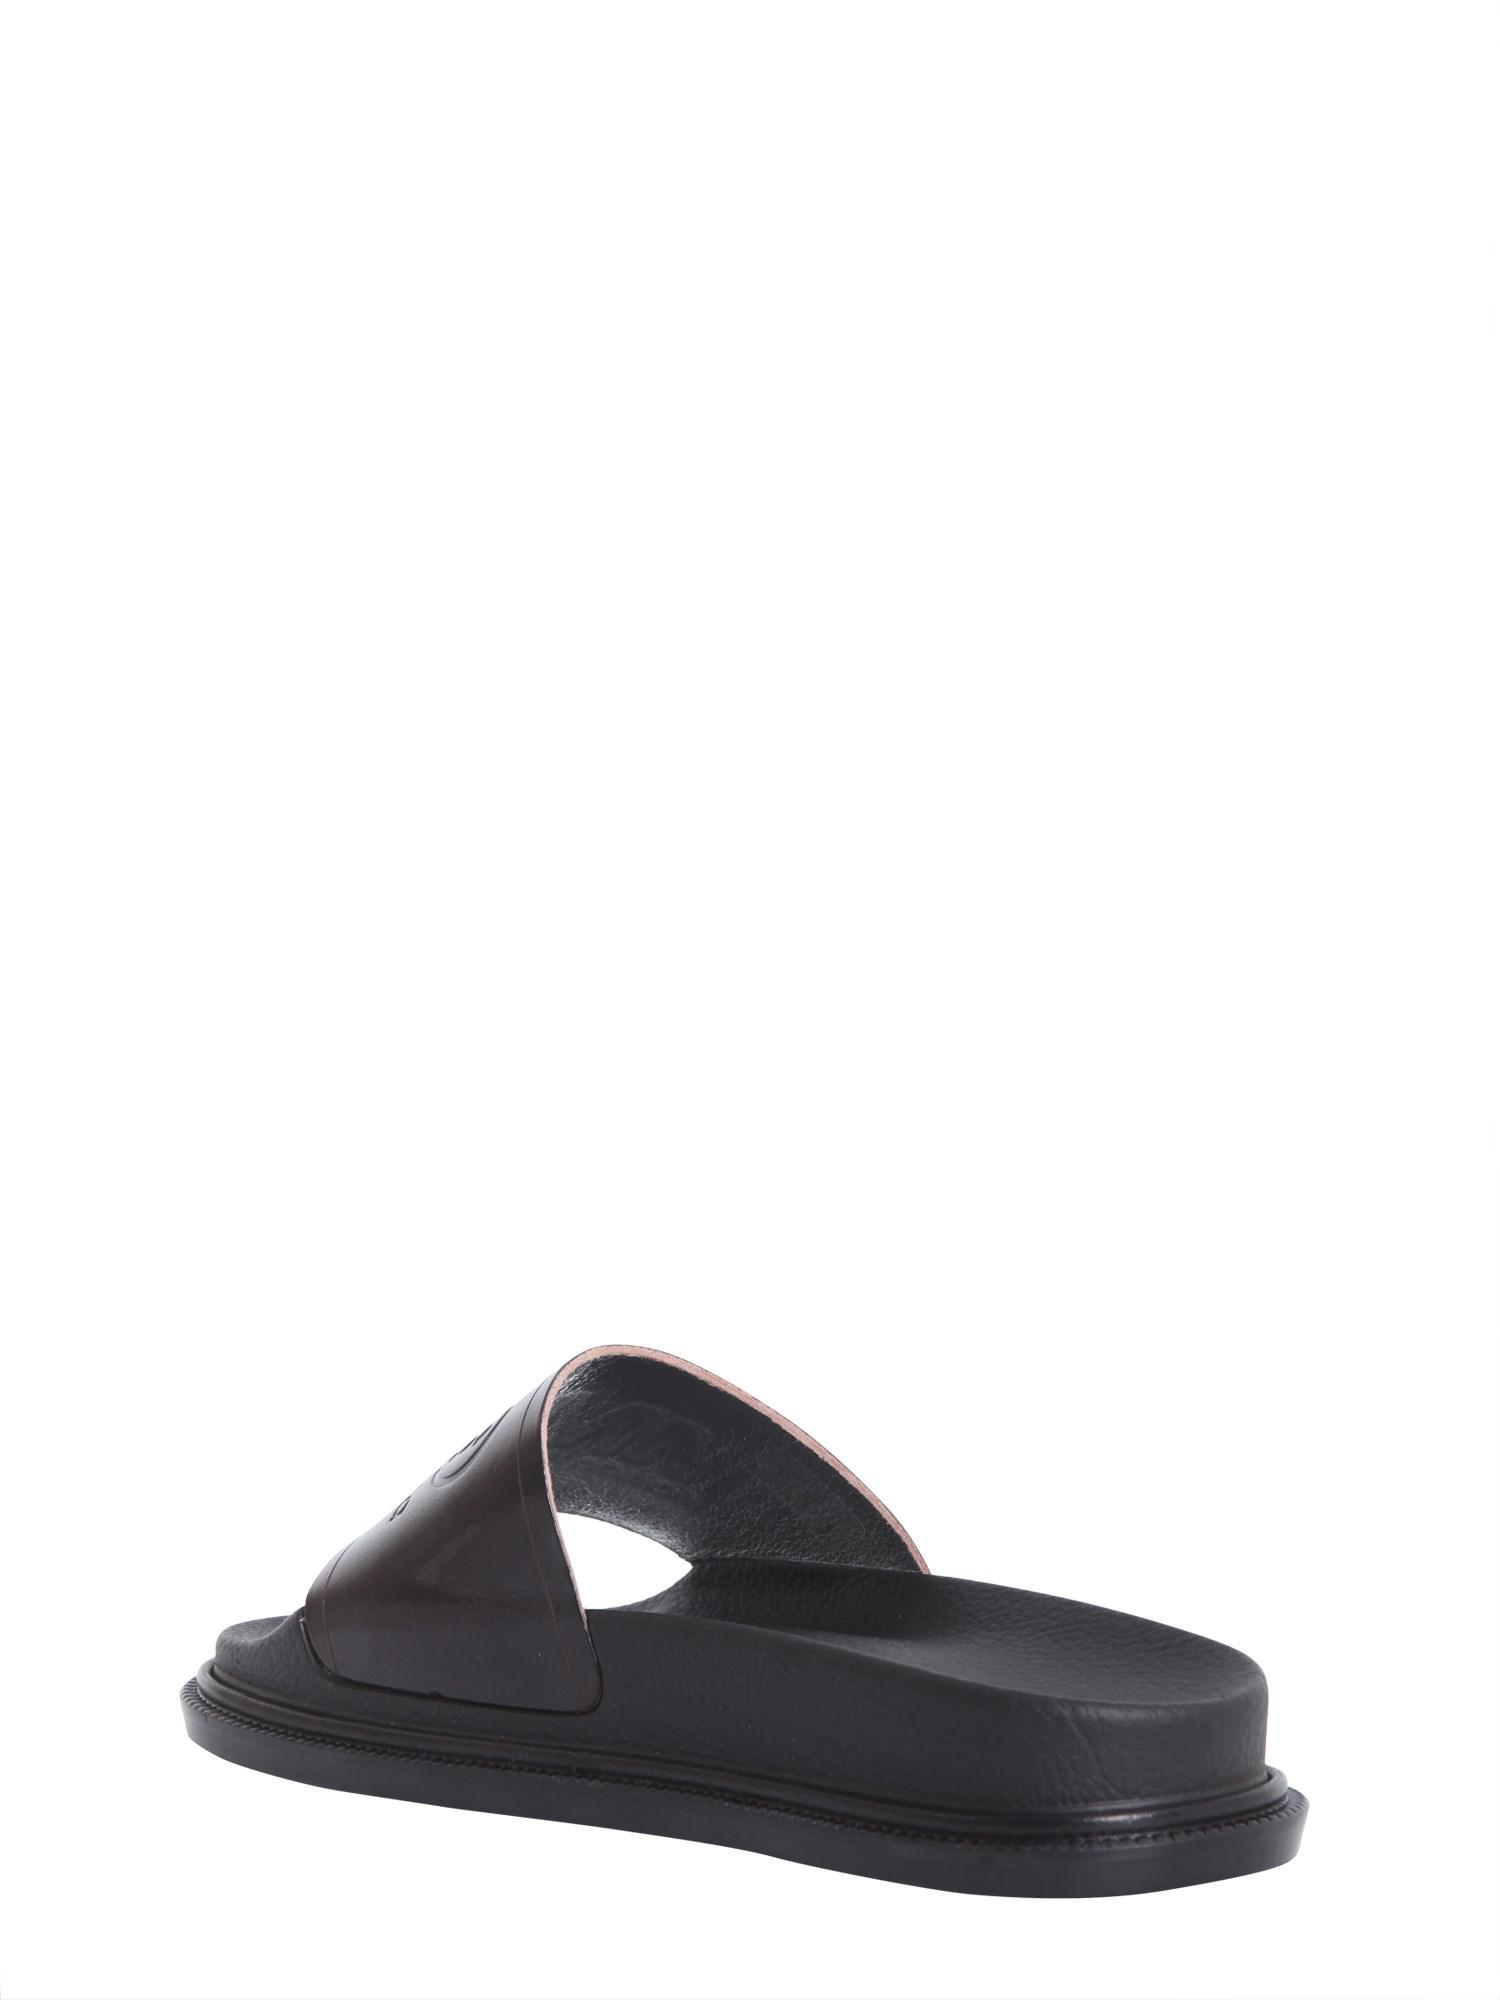 Outlet 100% Authentic MM6 MAISON MARGIELA Sandalo Cheap Sale Genuine Shopping Online Original 8hU1jYInSL